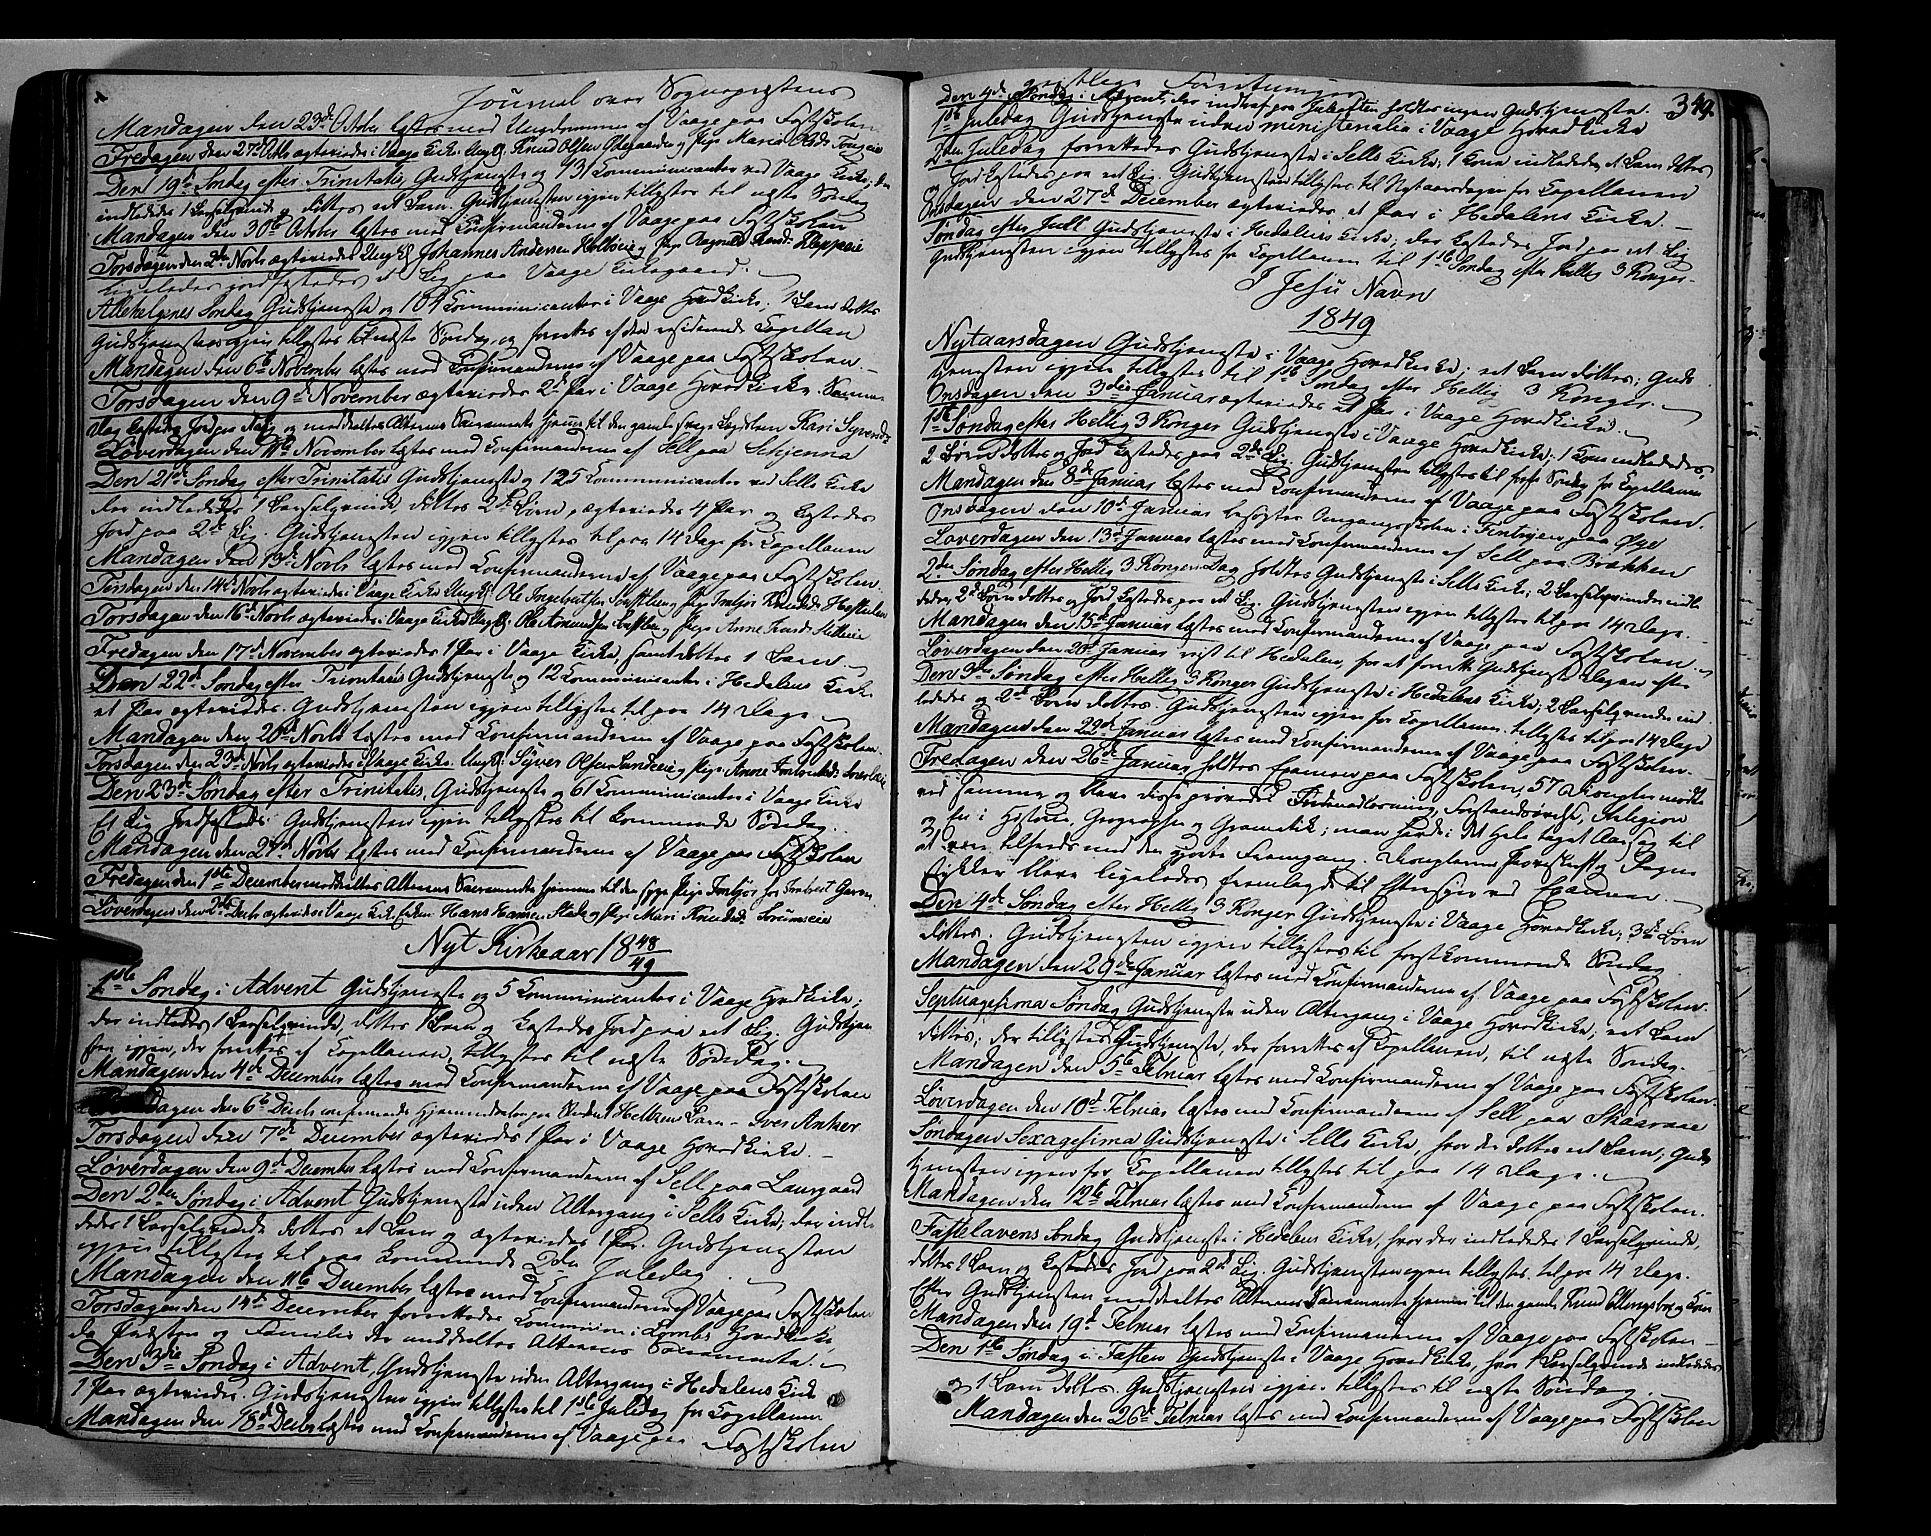 SAH, Vågå prestekontor, Ministerialbok nr. 5 /1, 1842-1856, s. 349